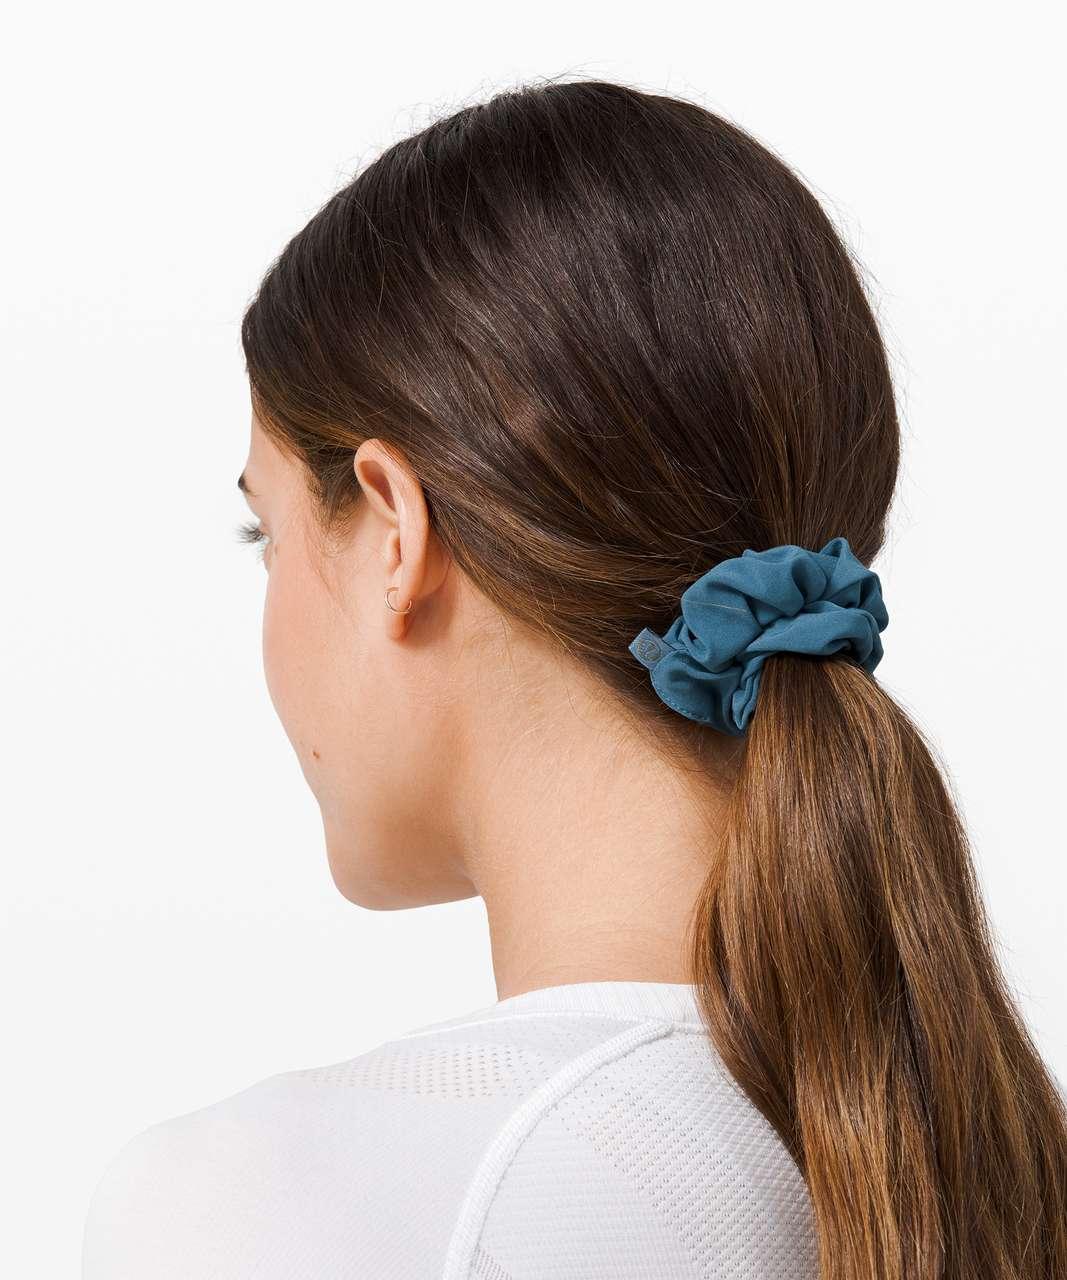 Lululemon Uplifting Scrunchie - Petrol Blue